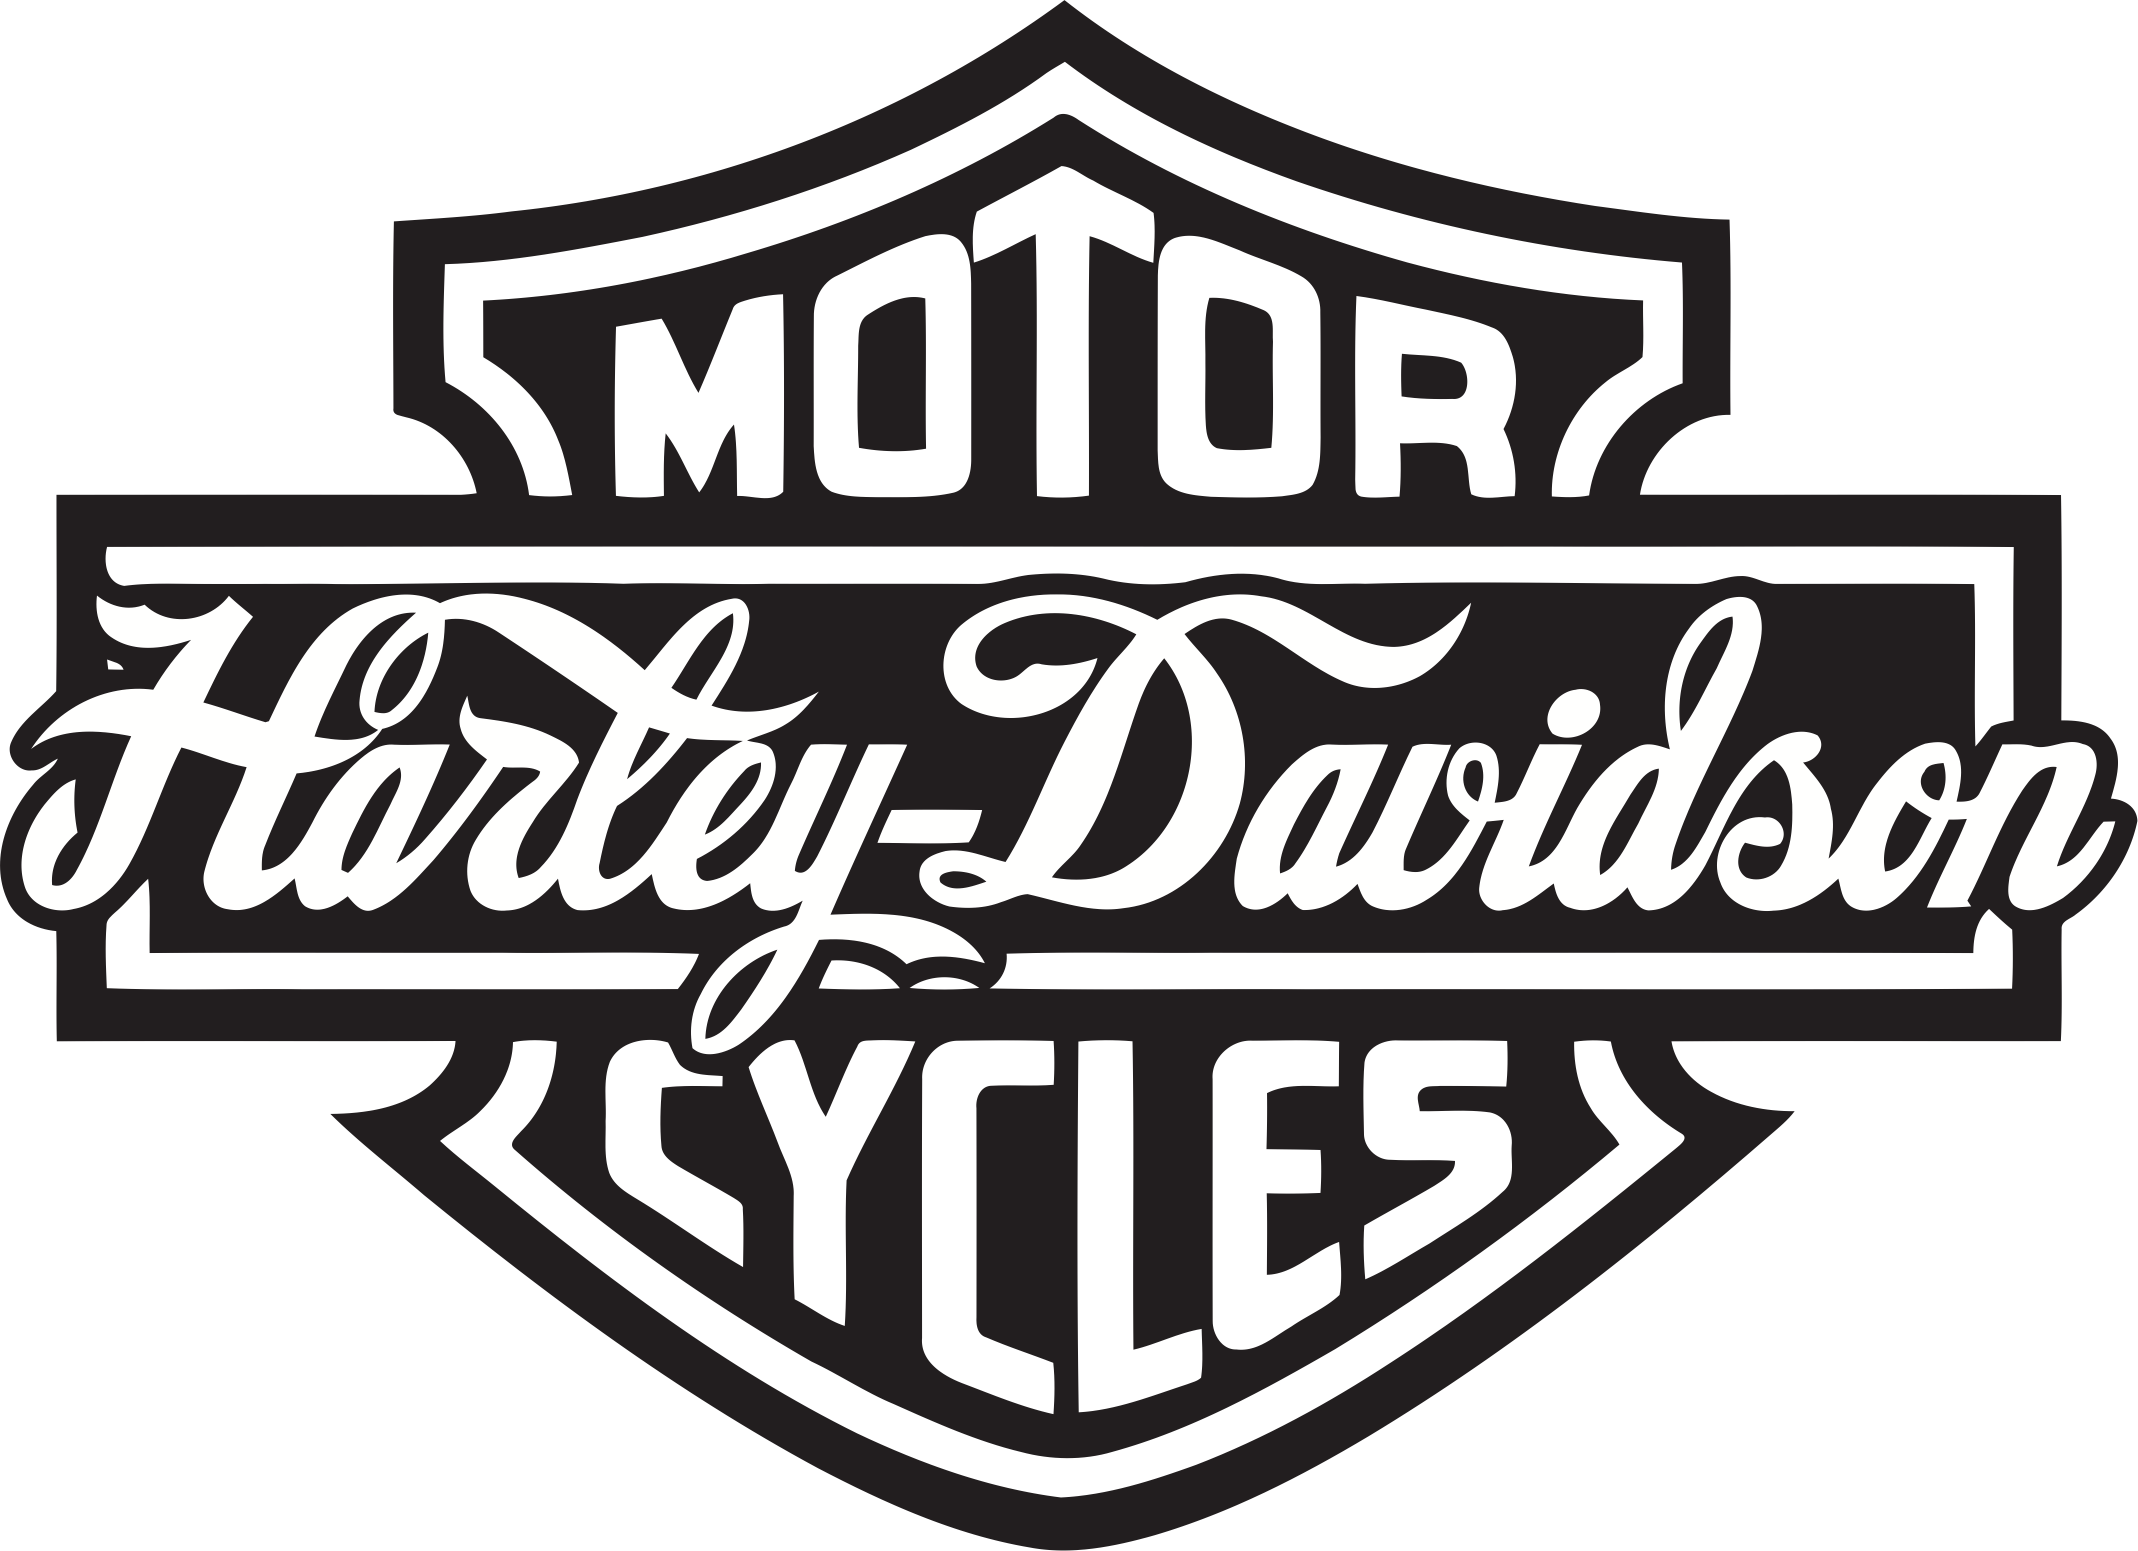 d43eaffcffd39e866471e987f200a208.png (2138×1551) Harley